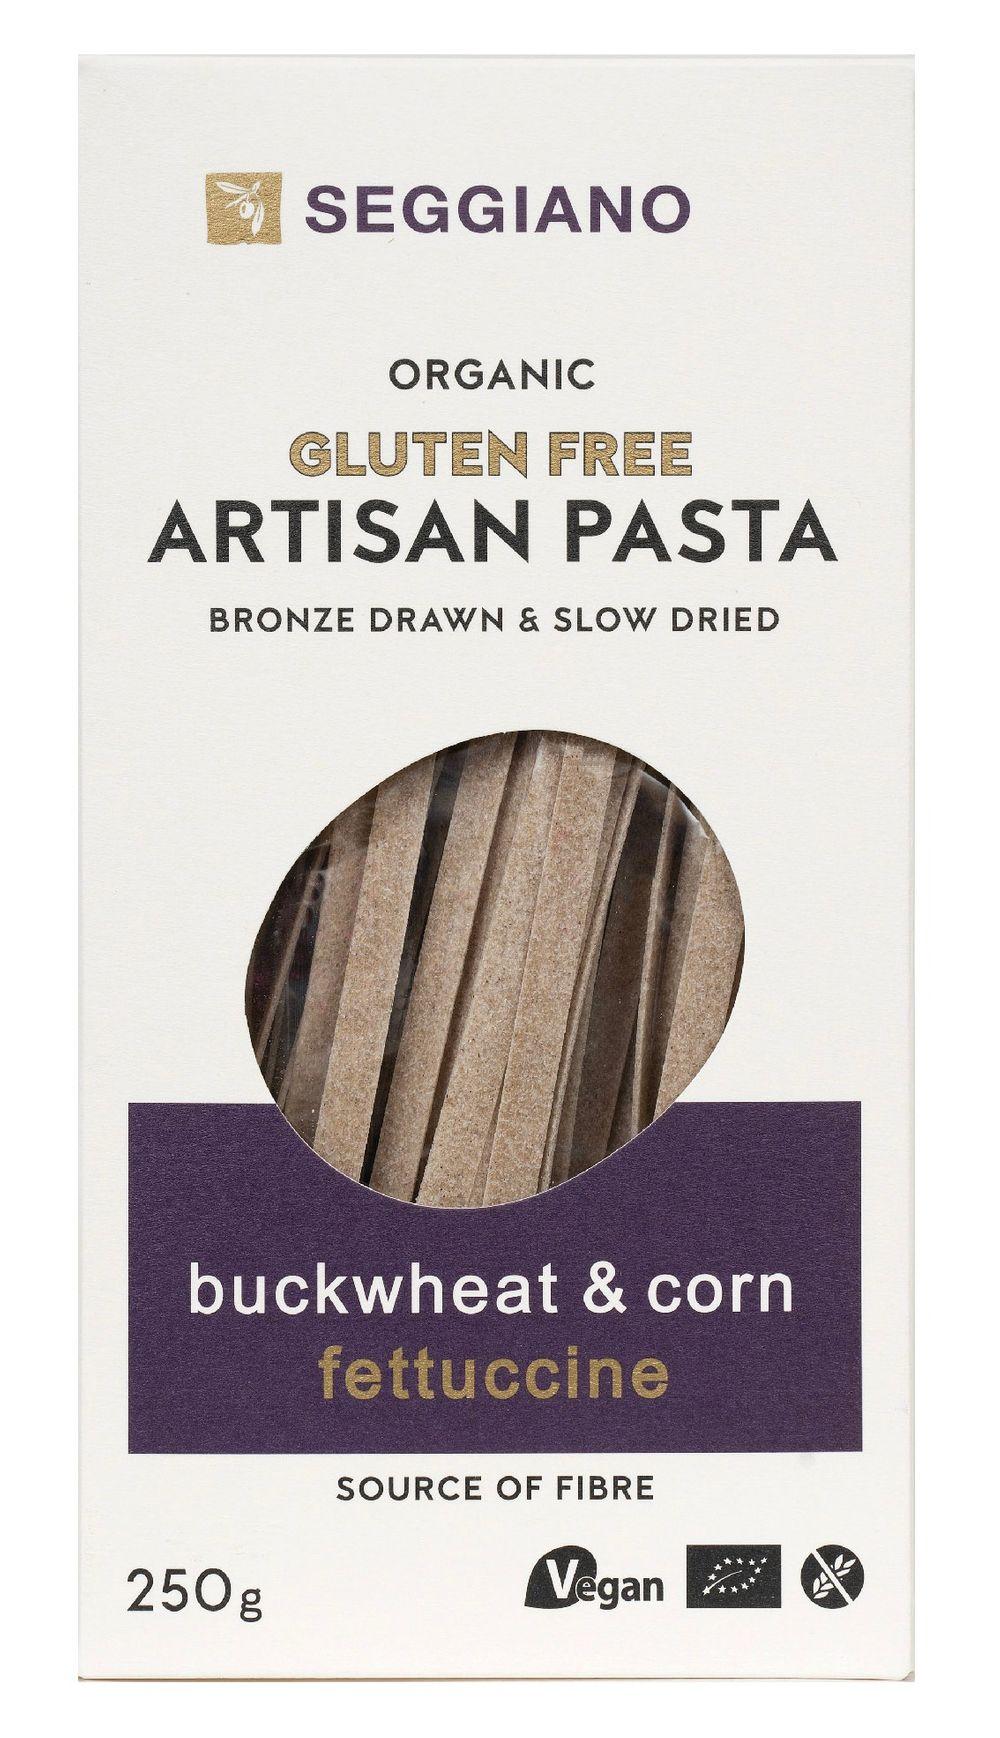 Organic Buckwheat & Corn Fettuccine